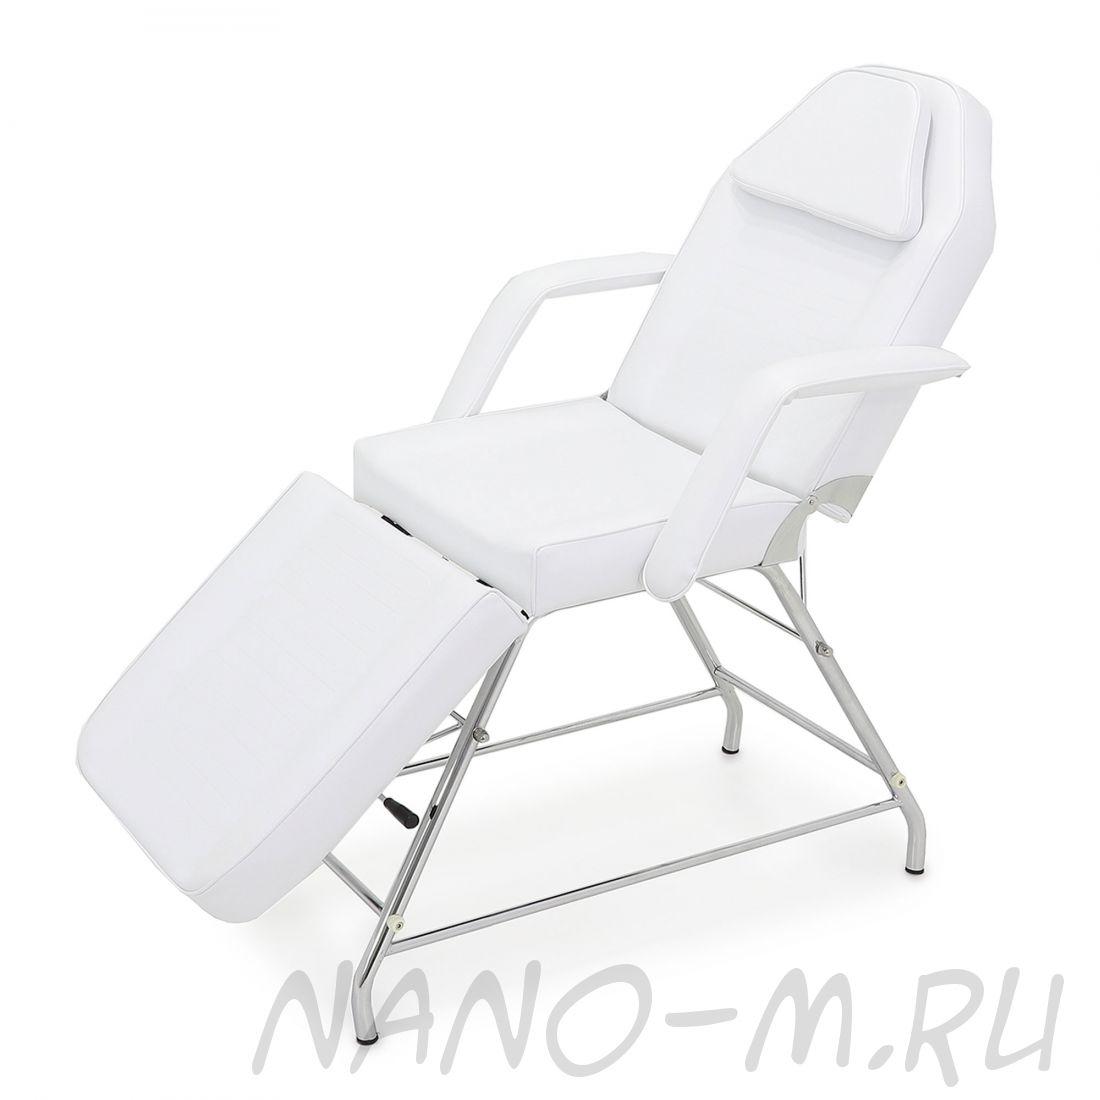 Косметологическое кресло JF-Madvanta (КО-169) - механика с РУ